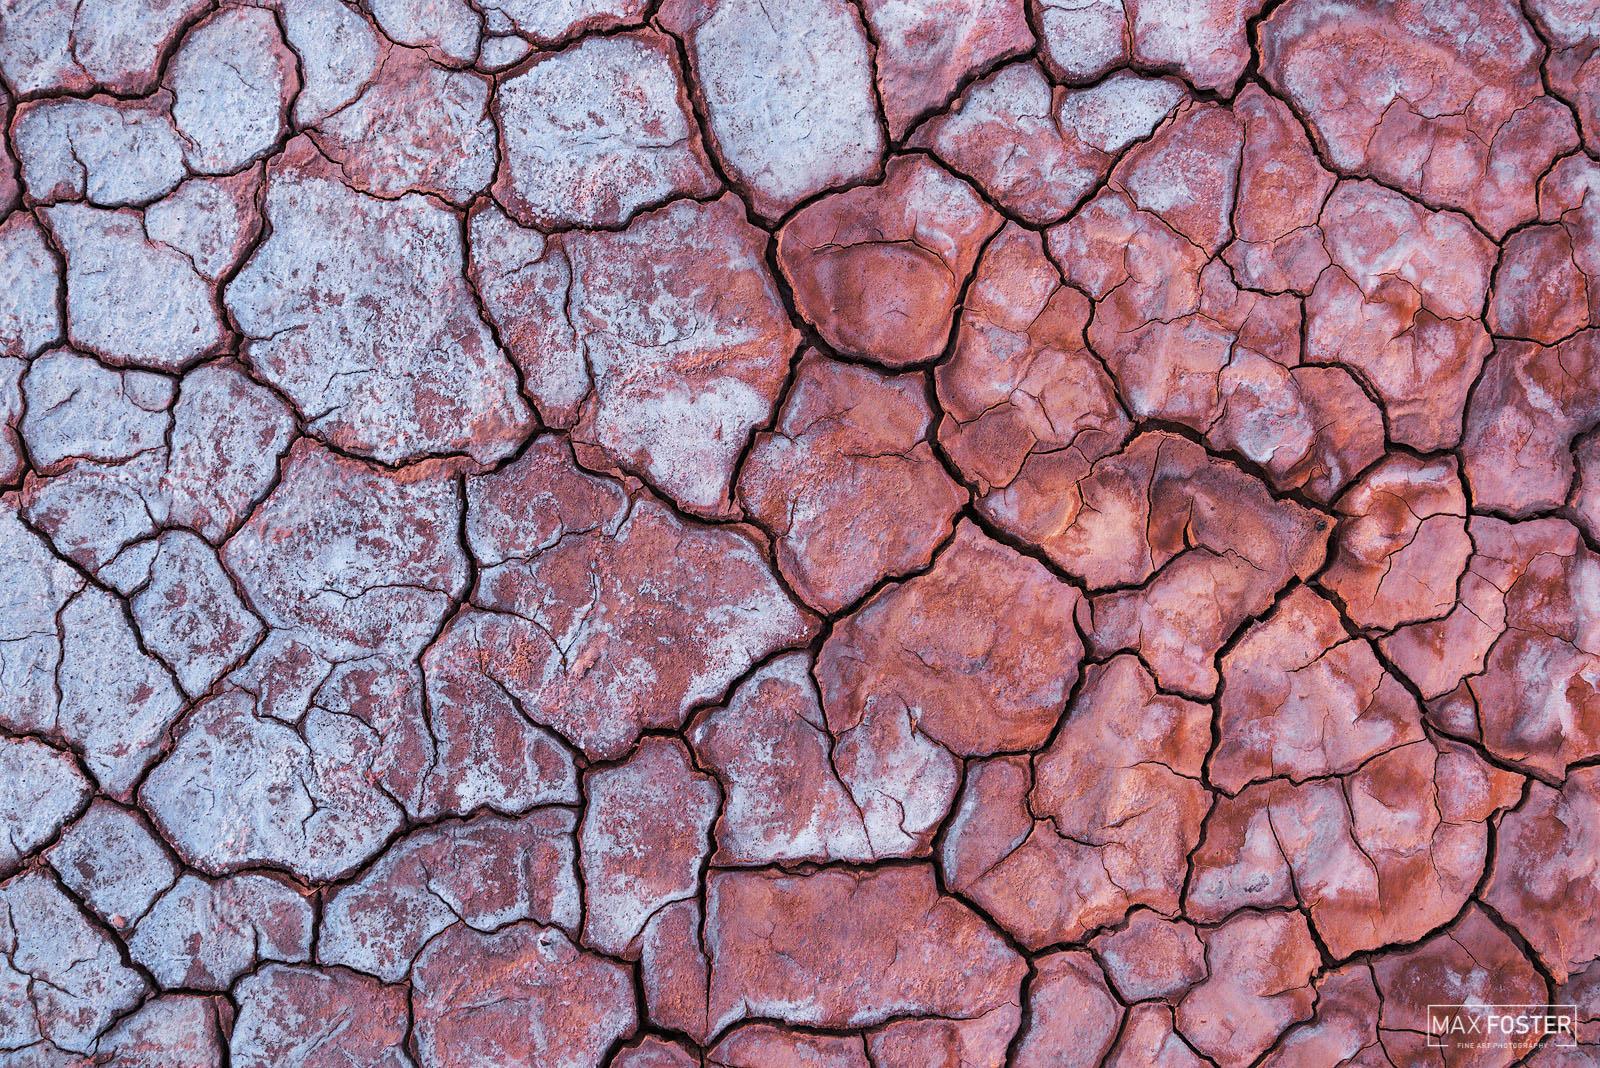 Death Valley National Park, California, Salt of the Earth, Salts, Dry Lake, Mudcracks, Cracked Mud, photo